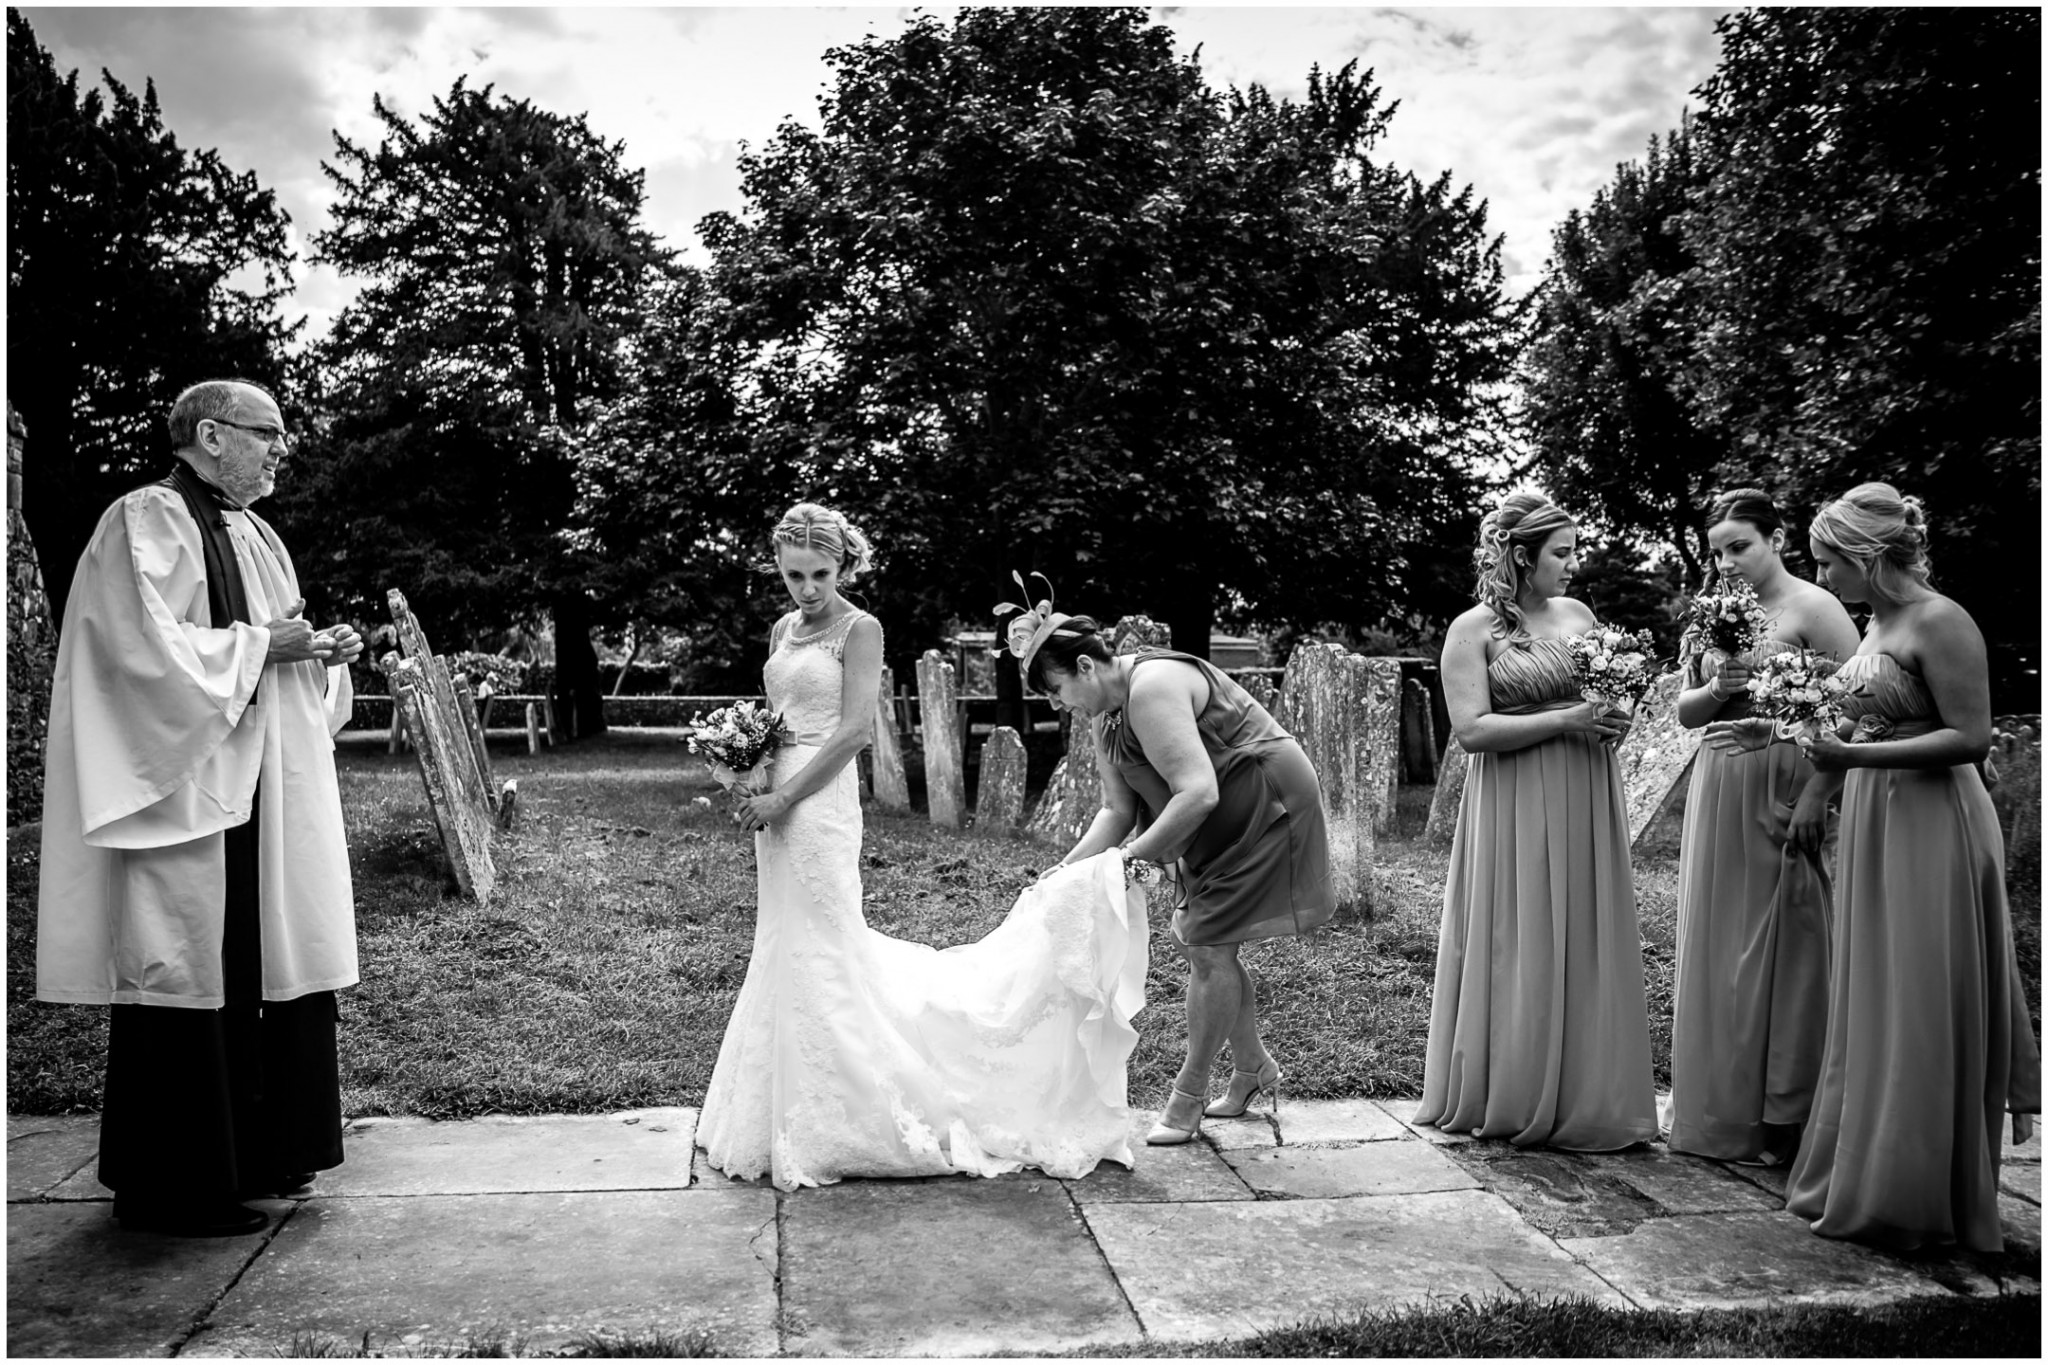 St Thomas a Becket Church Wedding Bride with Bridesmaids outside church